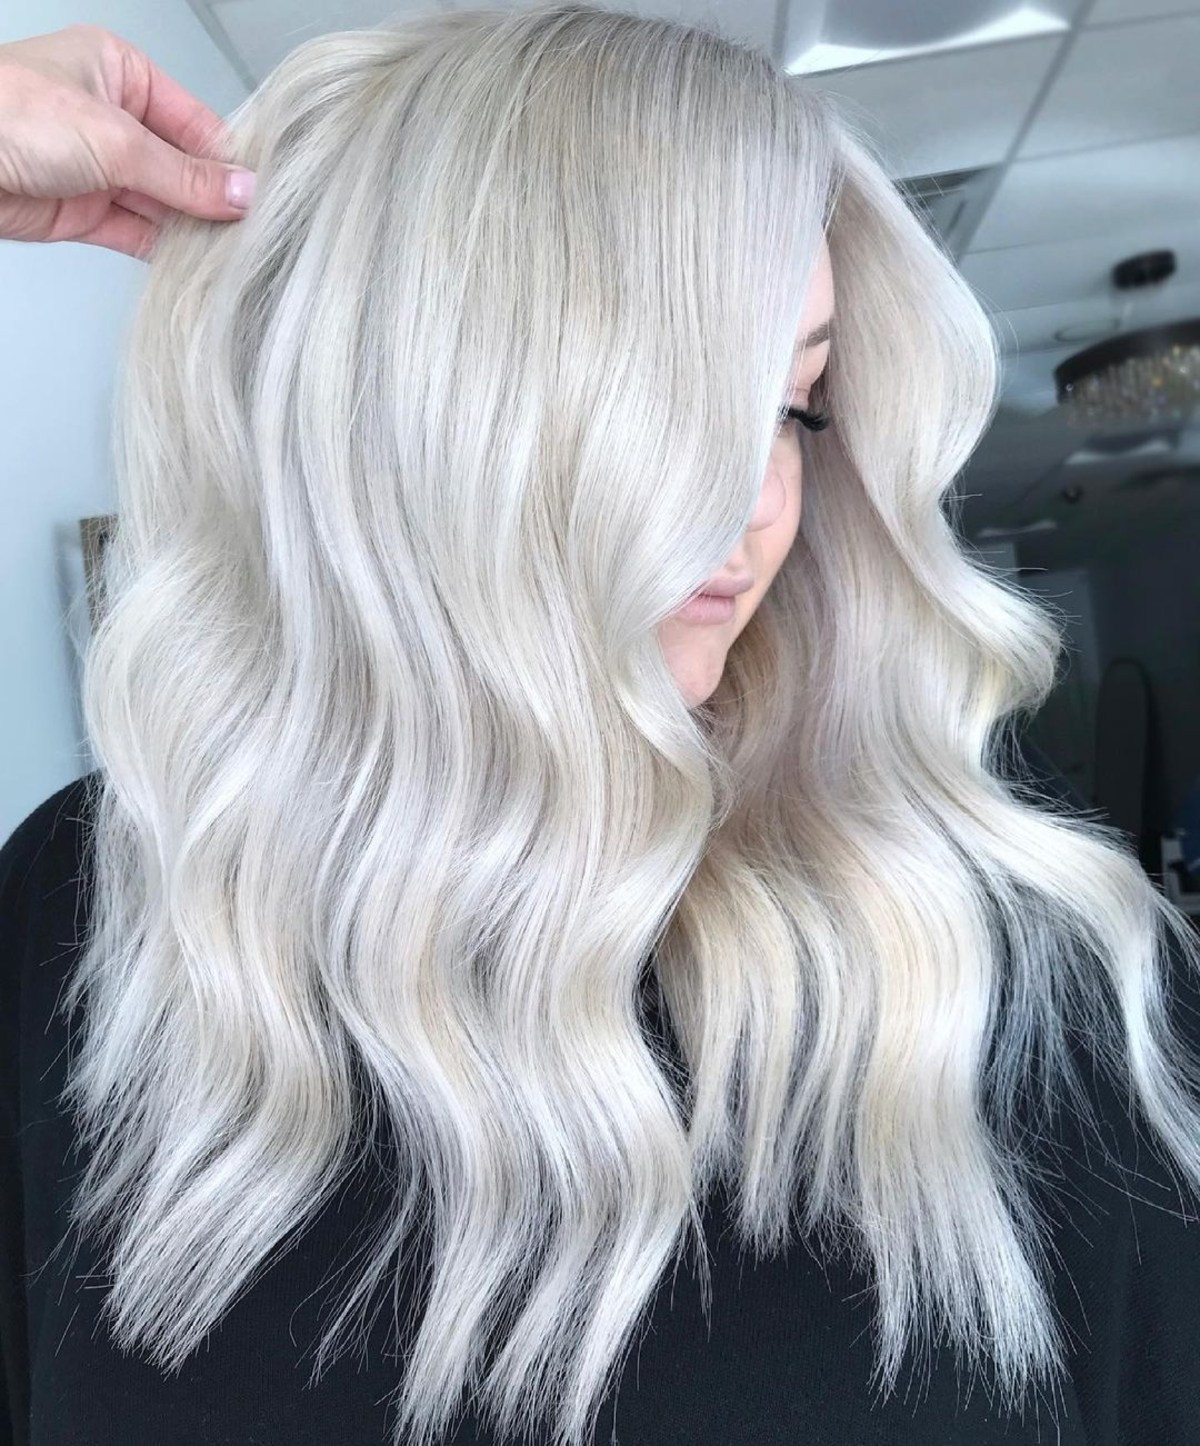 A platinum blonde with dimensional tones